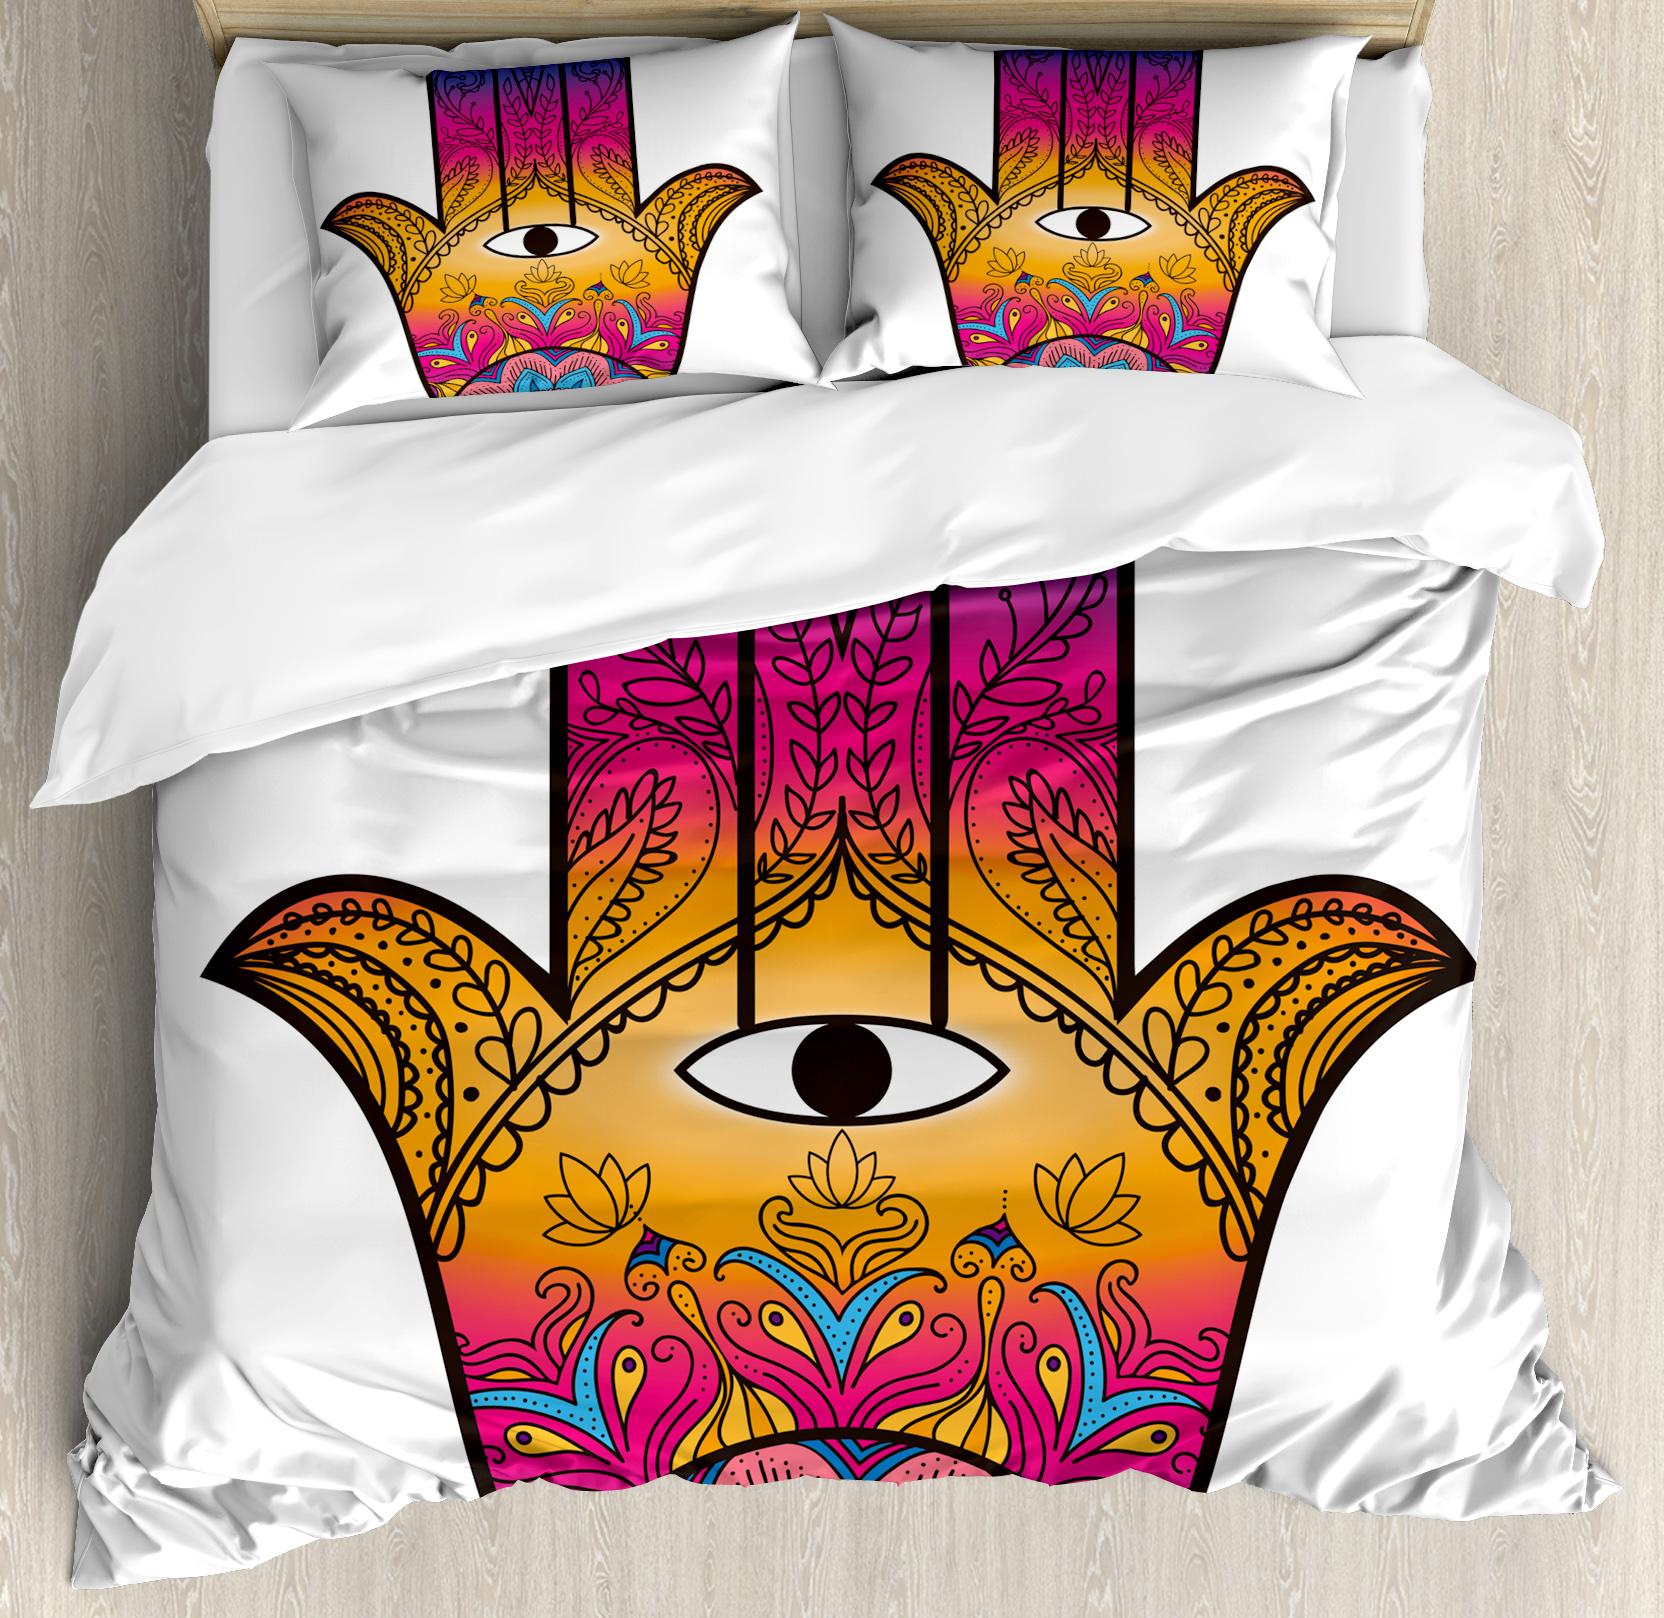 Hamsa King Size Duvet Cover Set, Colorful Ethnic Pattern ...